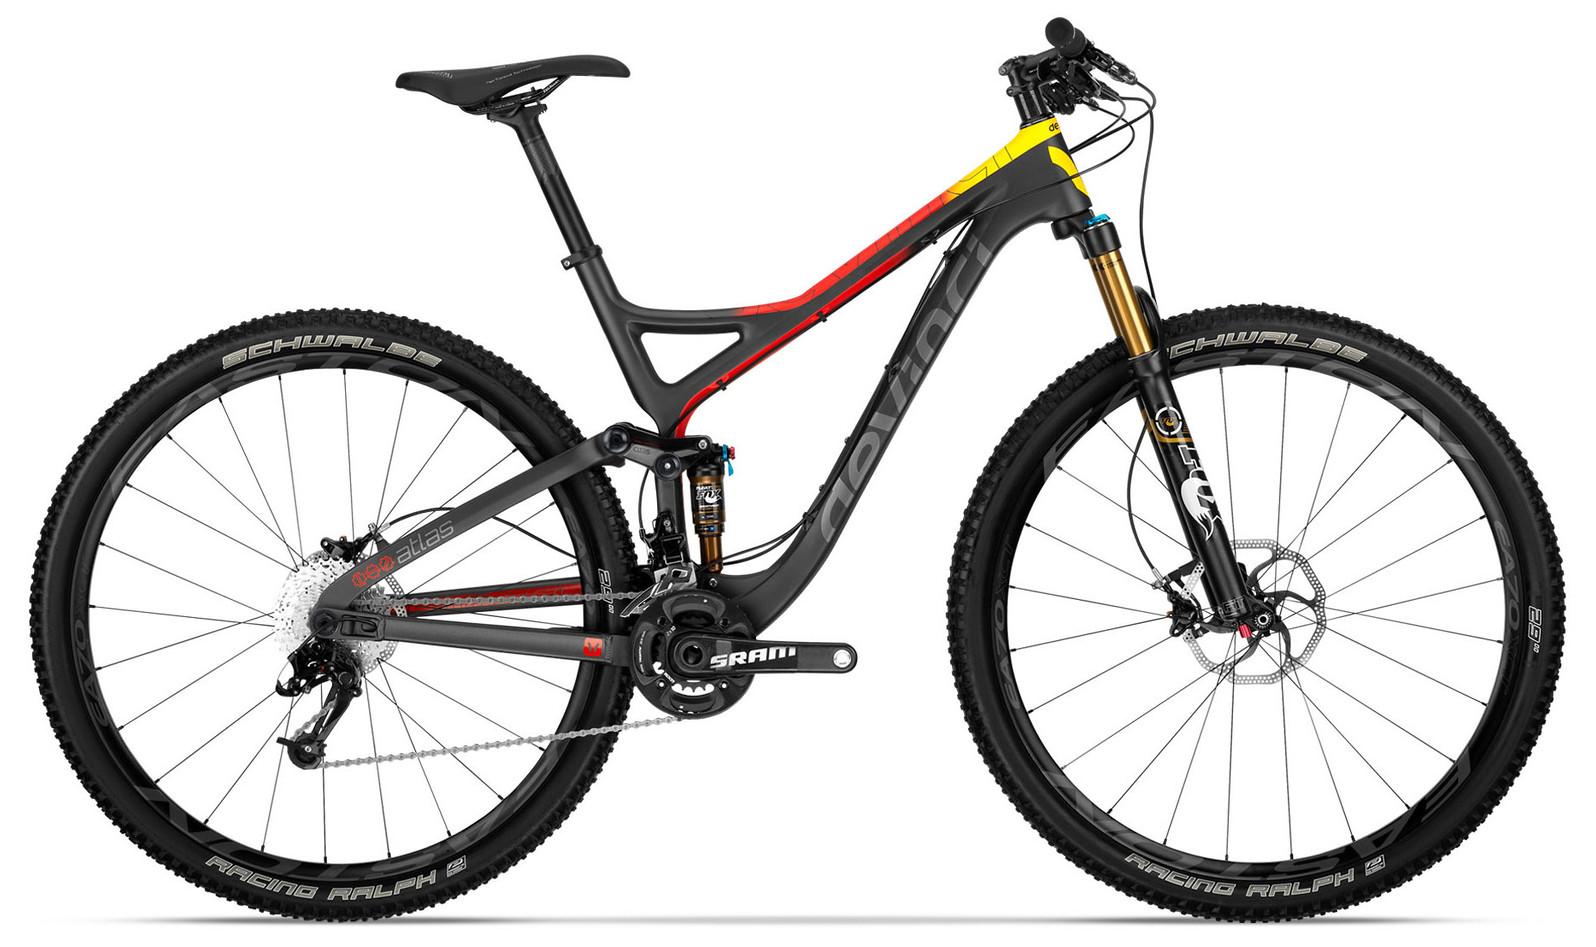 Bike - 2014 Devinci Atlas Carbon SL